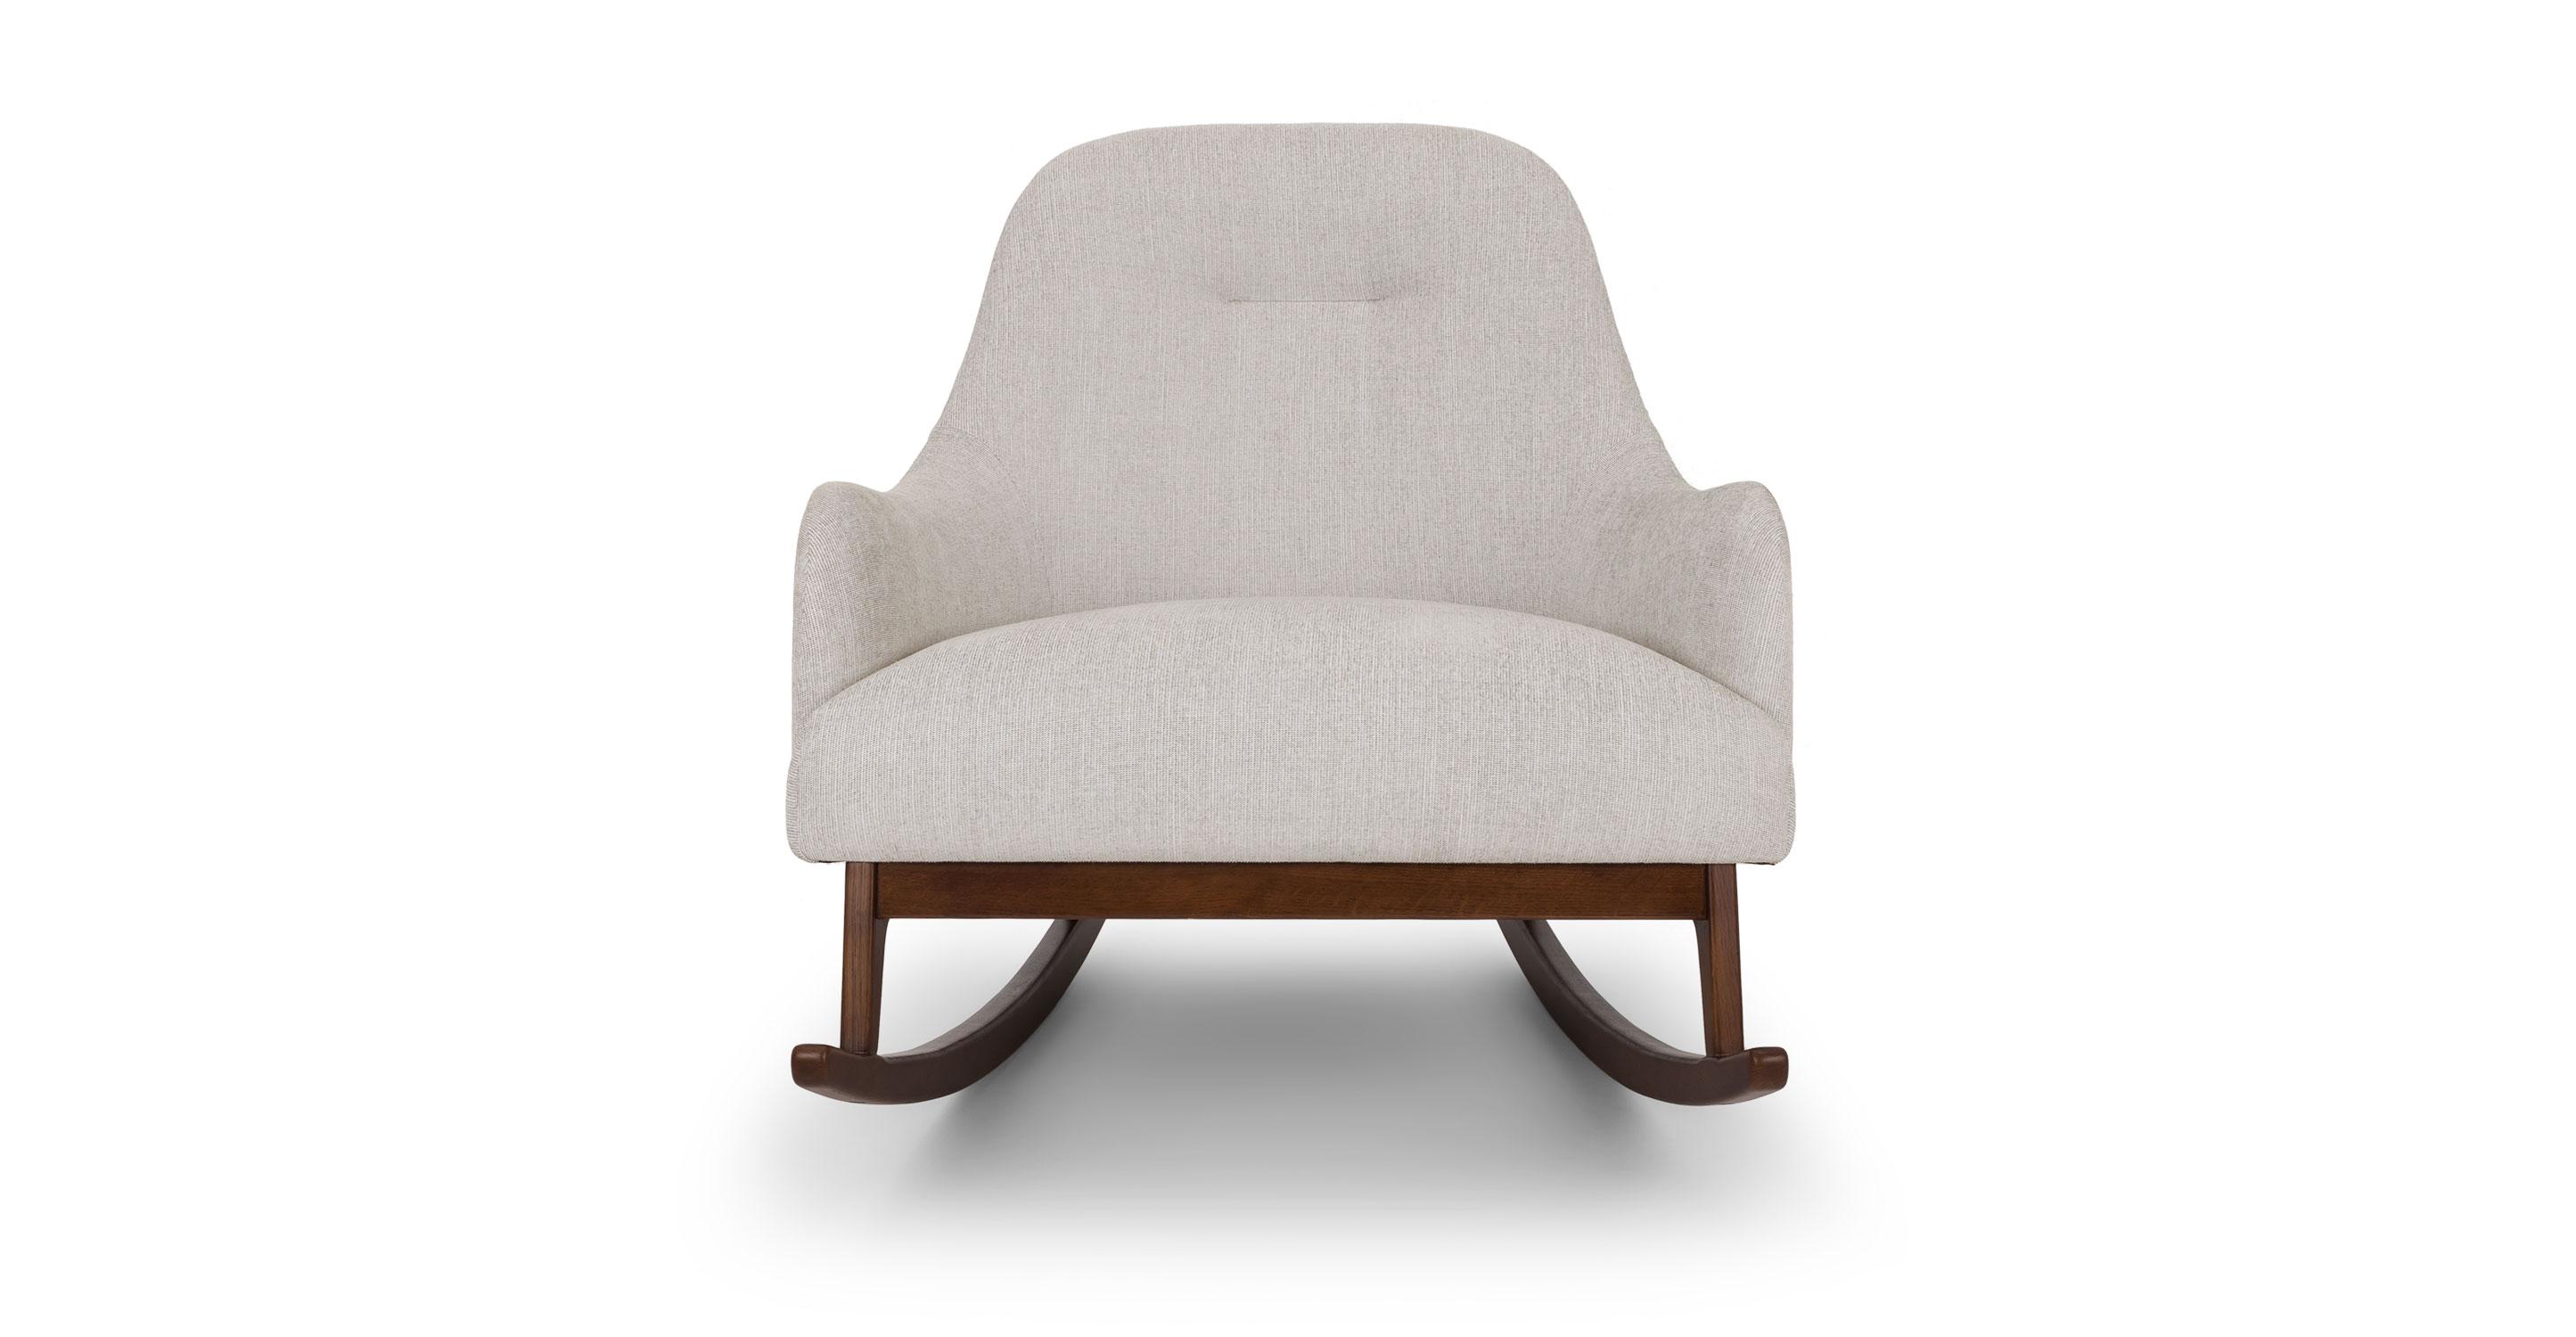 Hug coconut white rocking chair - lounge chair - Article |  modern, DLLXGDA